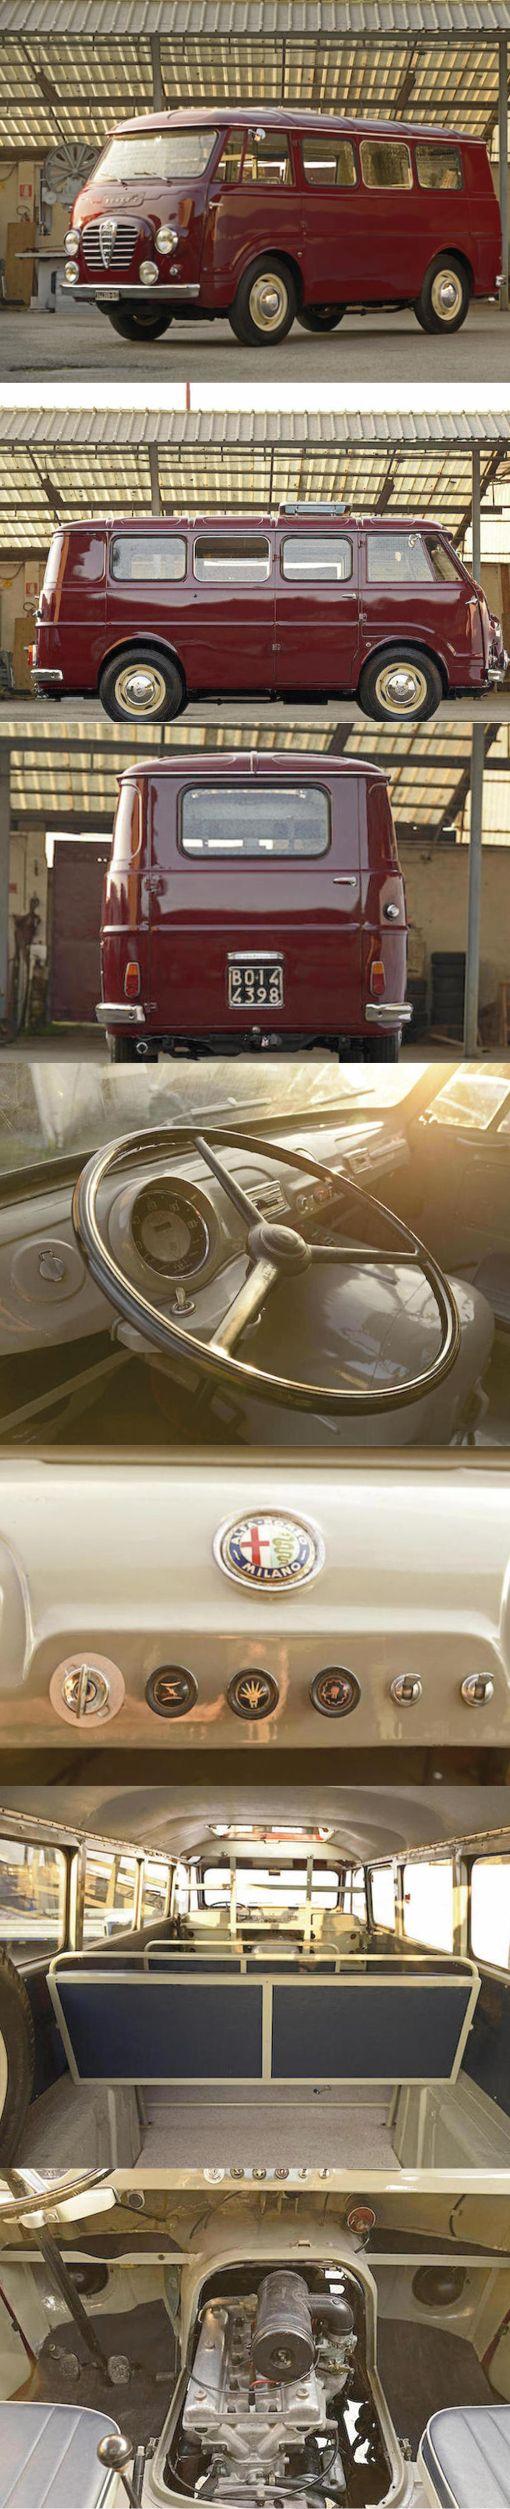 1954 Alfa Romeo T10 Autotutto / Italy / red